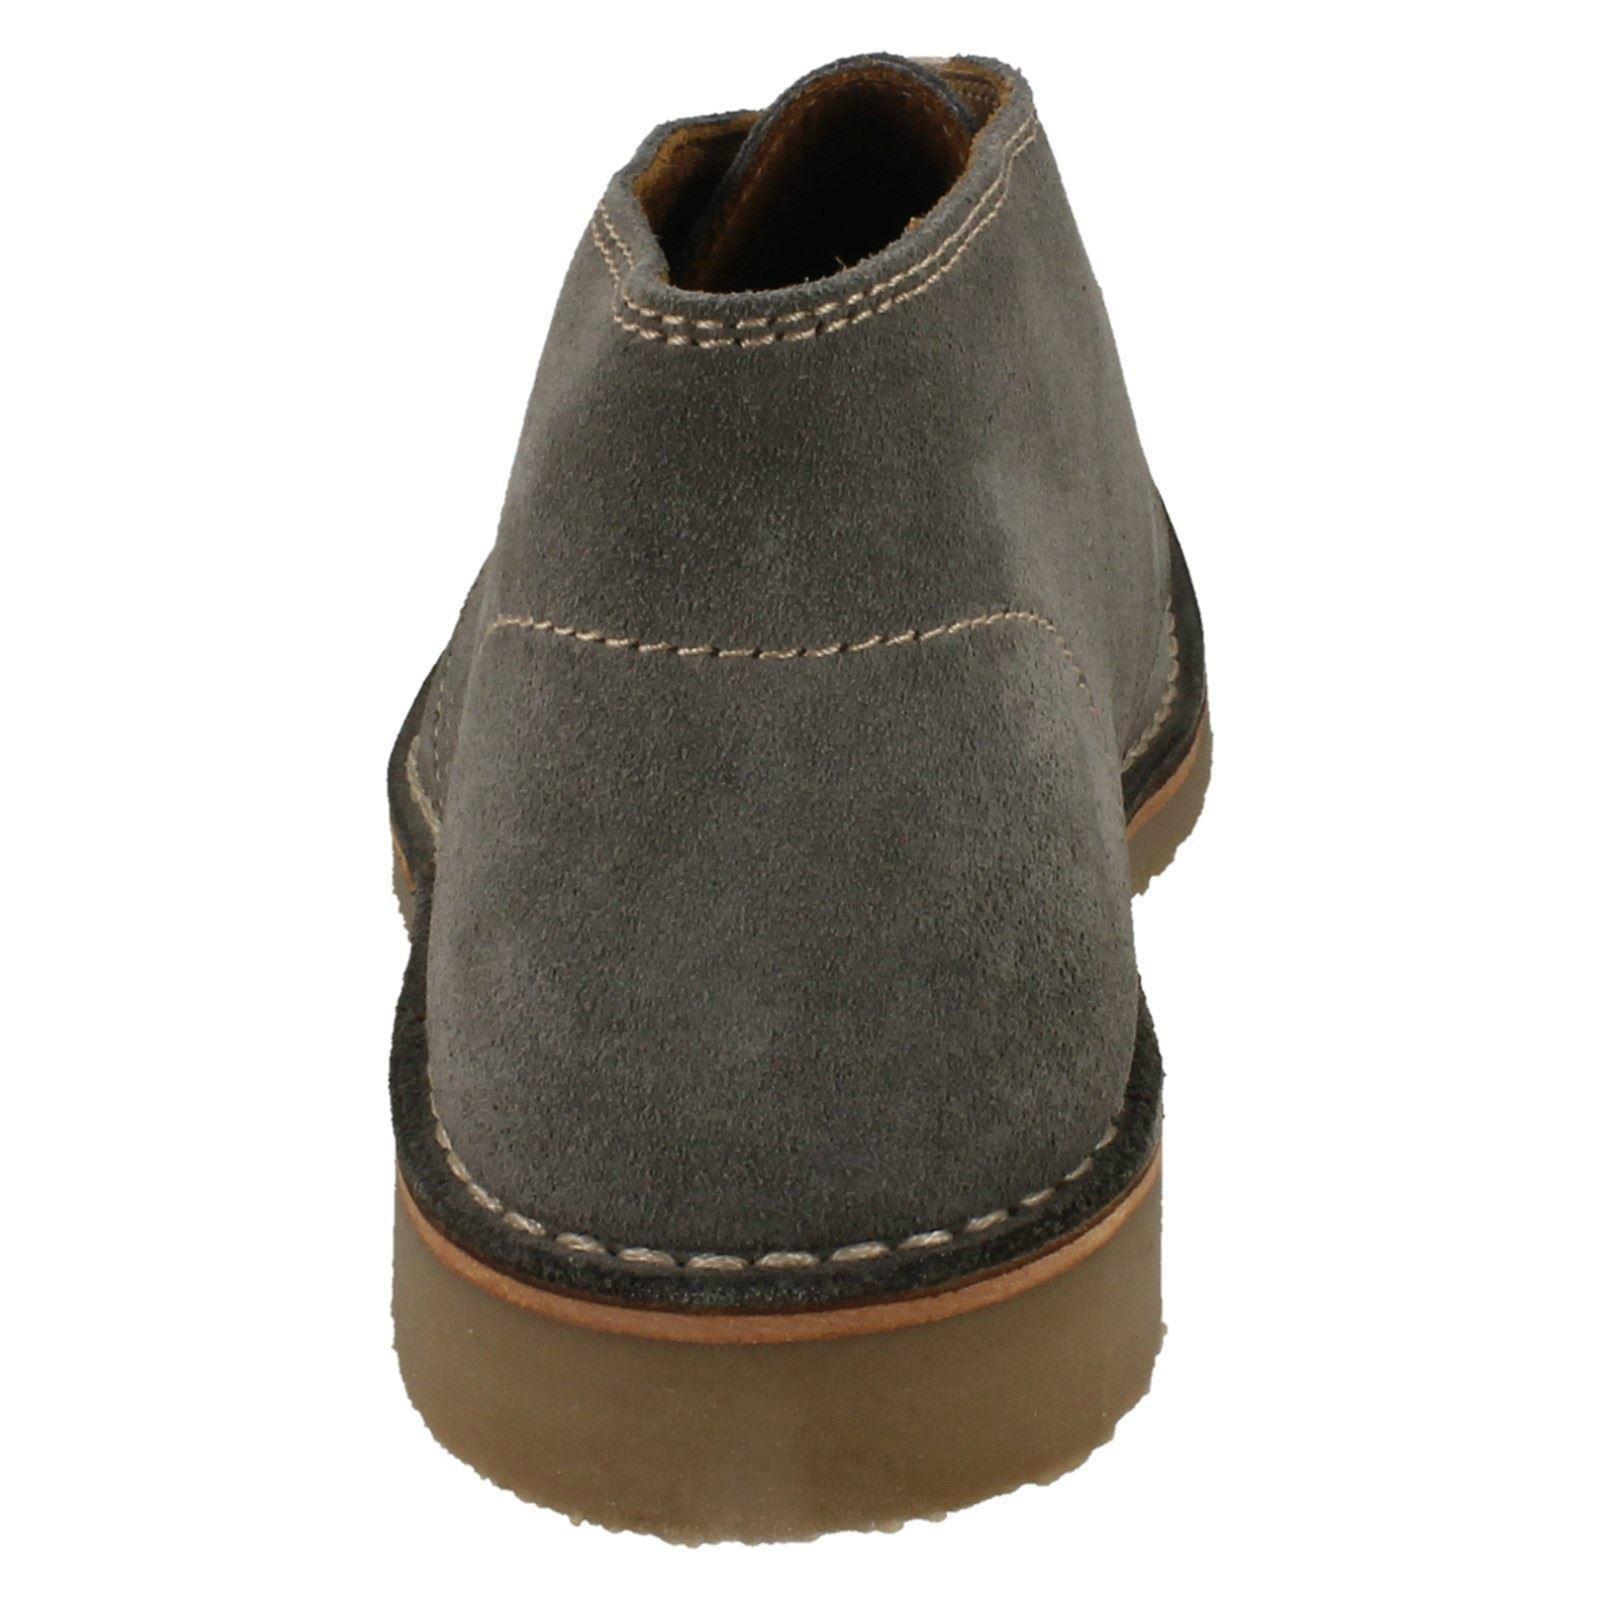 Mens Loake Desert Style Suede Boots Kalahari